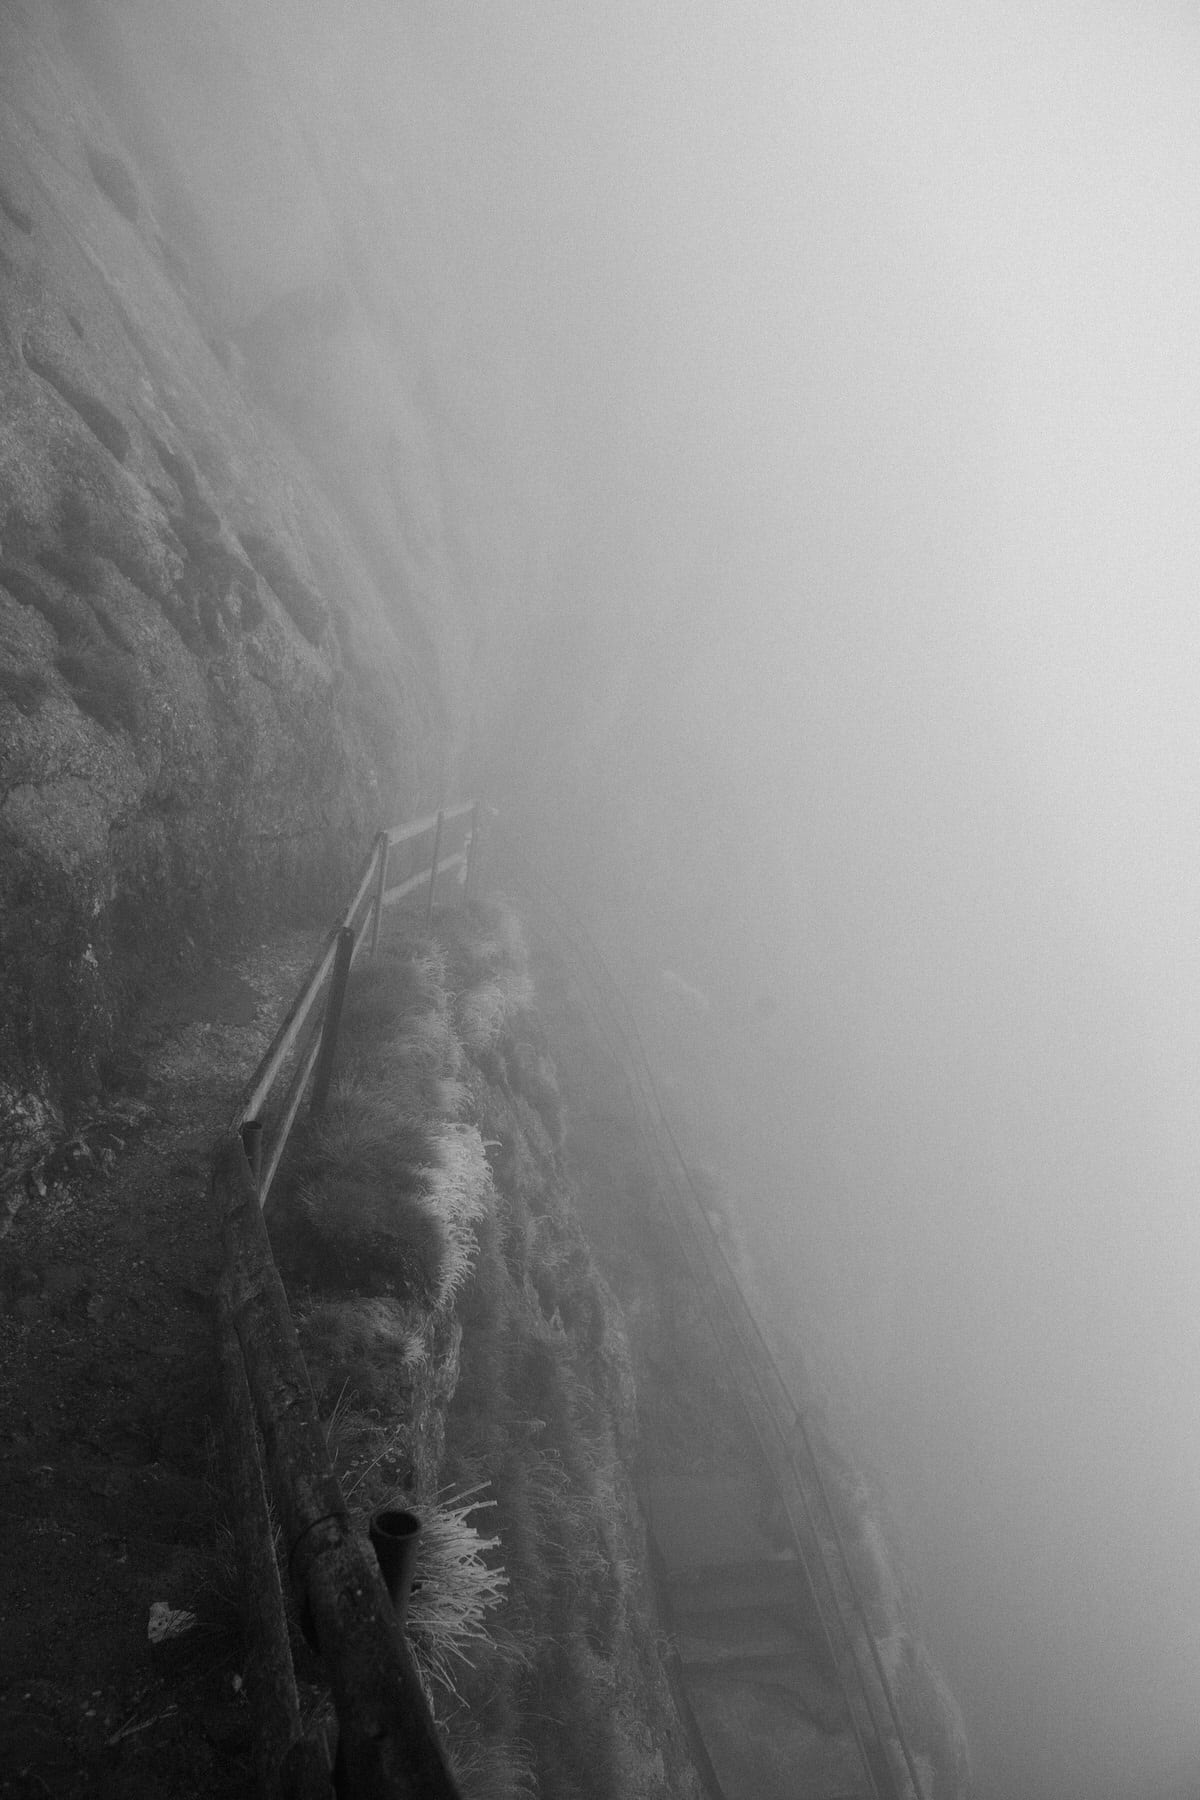 Mount_Pilatus_Lucerne_Switzerland-black-and-white-fine-art-photography-by-Studio-L-photographer-Laura-Schneider-_4400